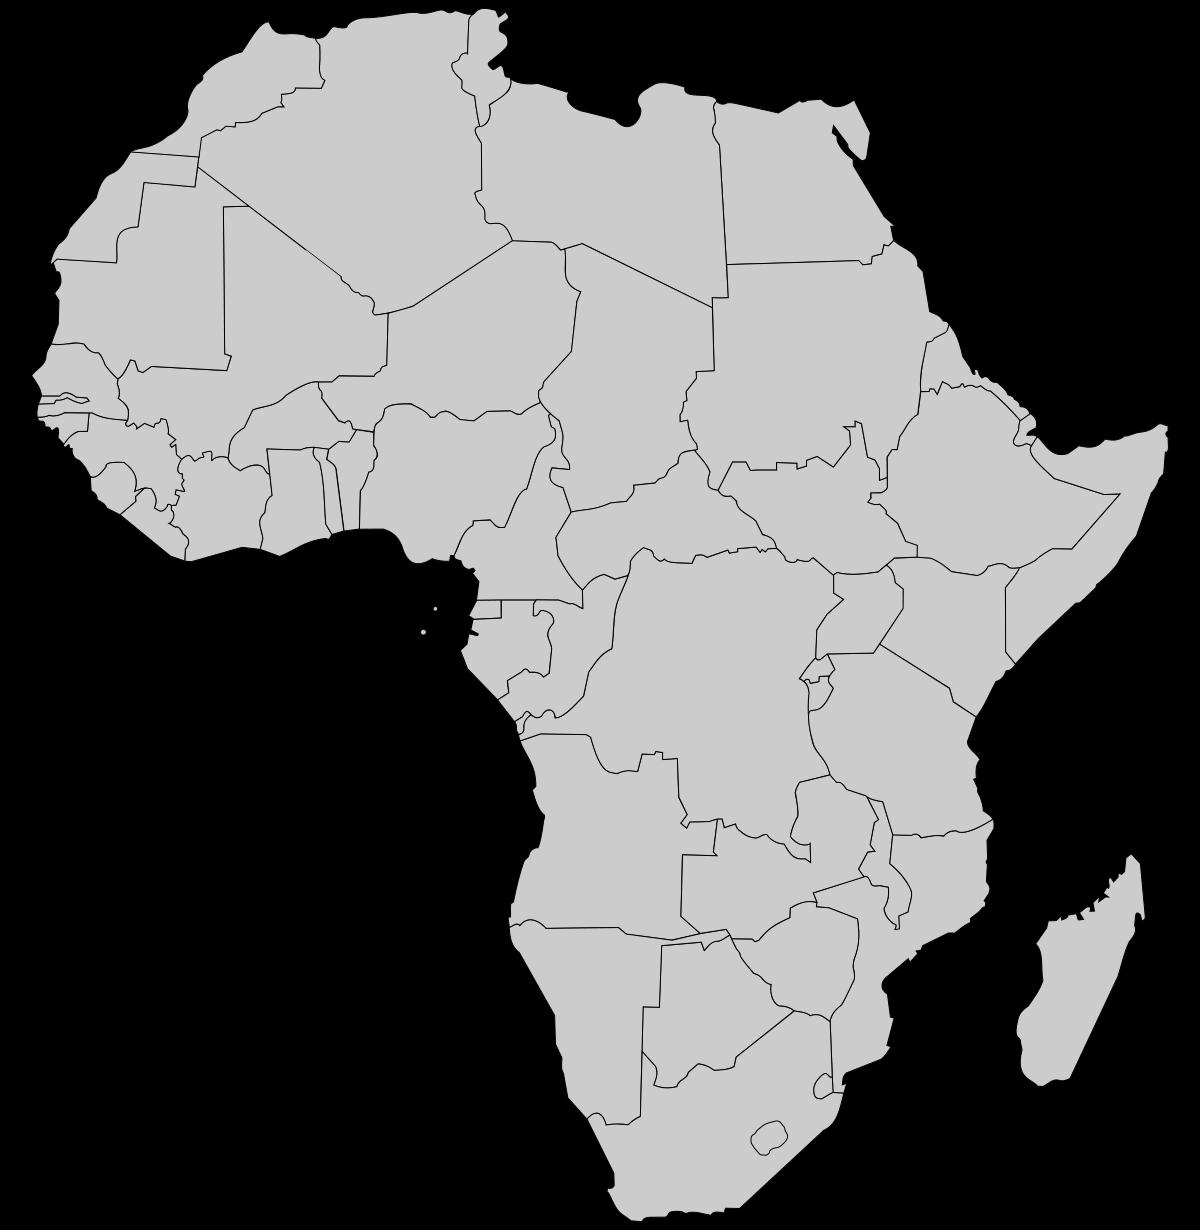 File:Blank Map.